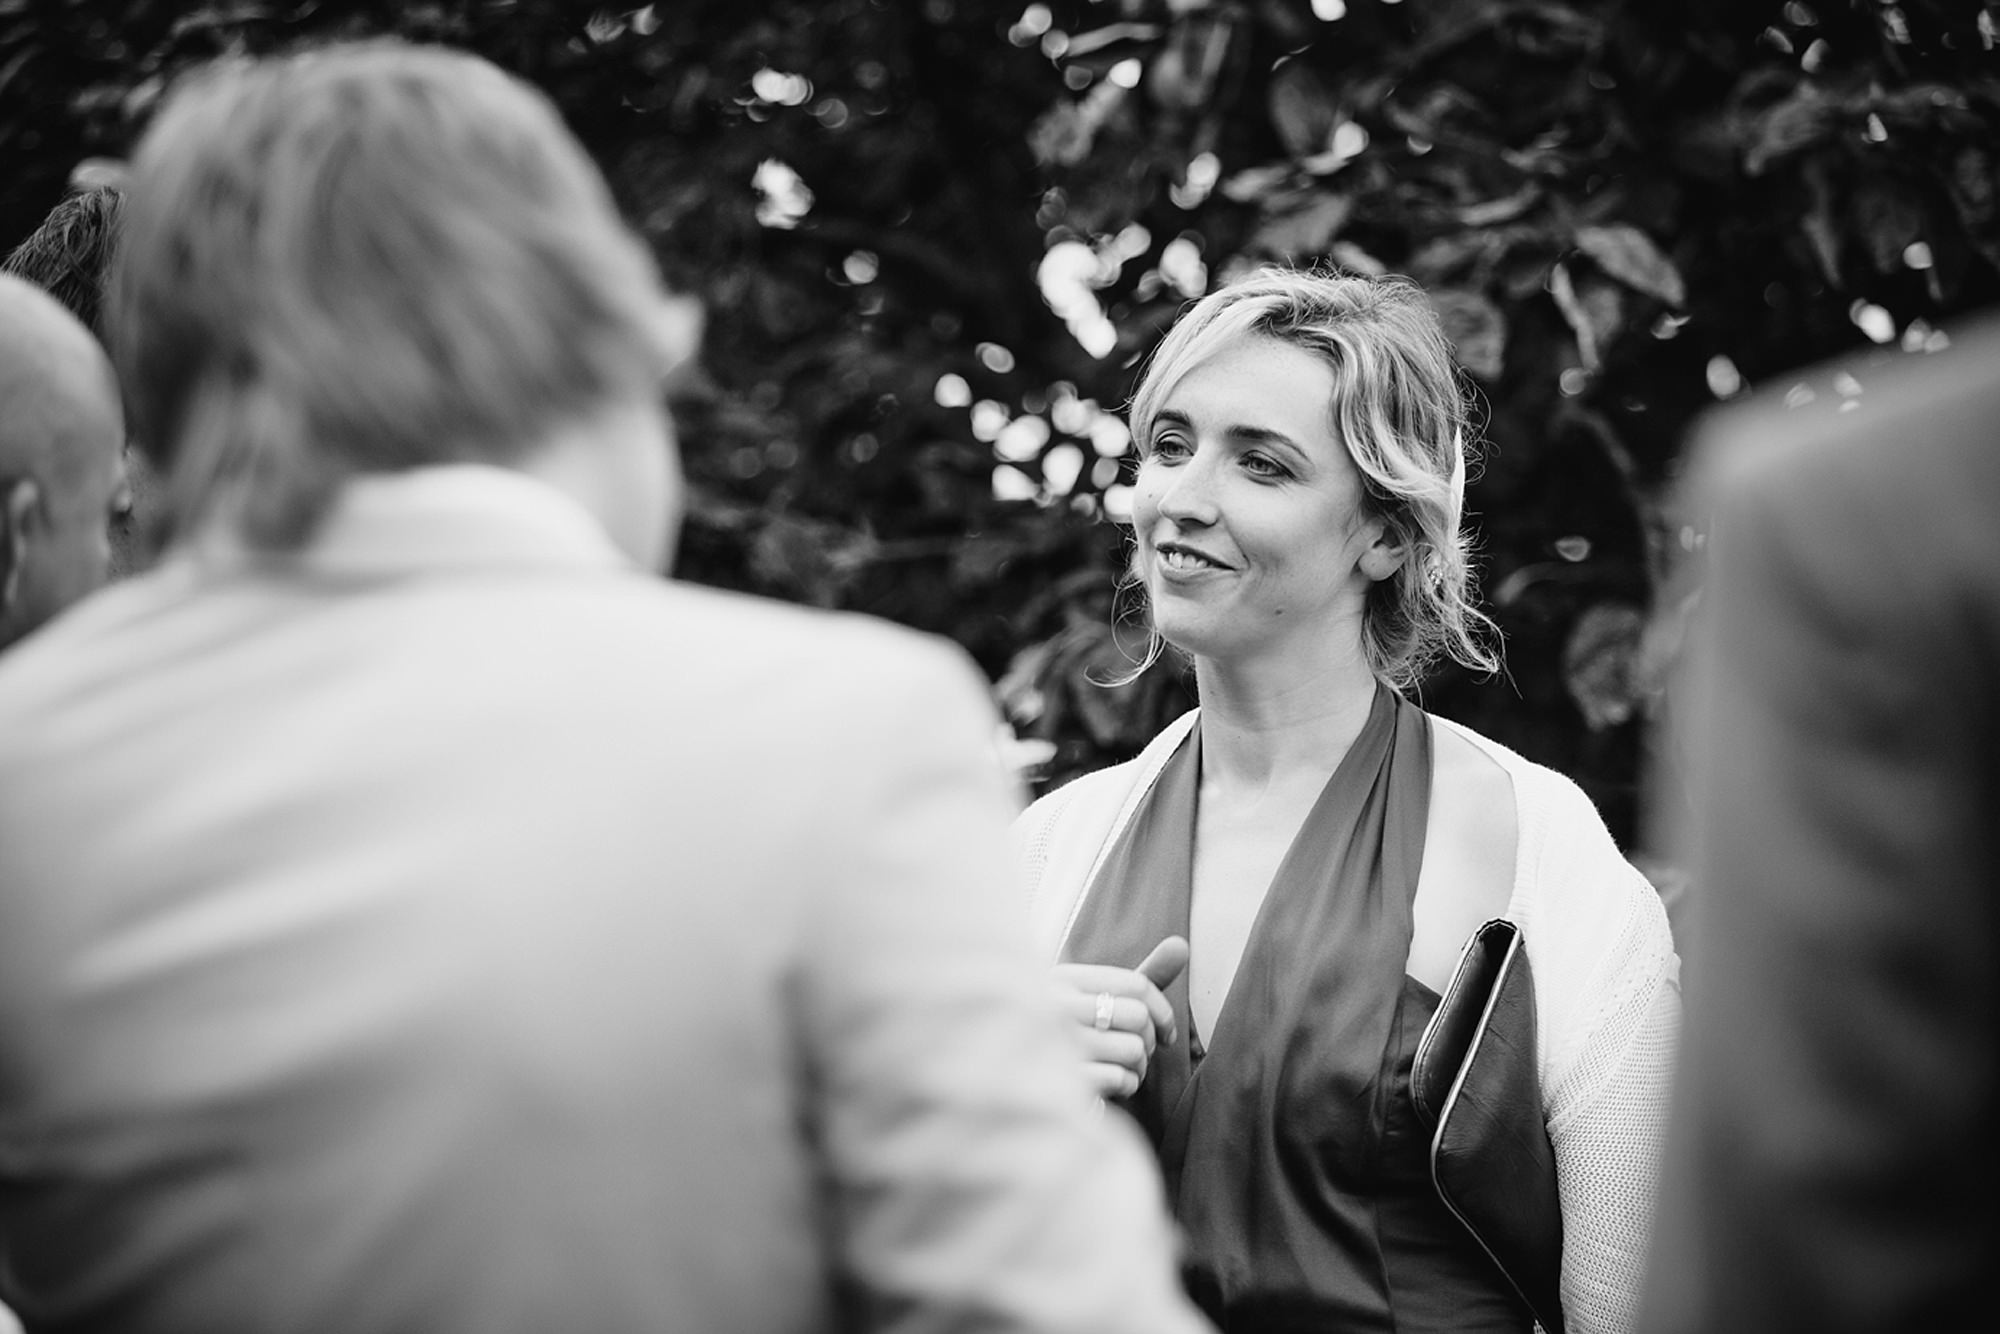 outdoor humanist wedding photography portrait of wedding guest